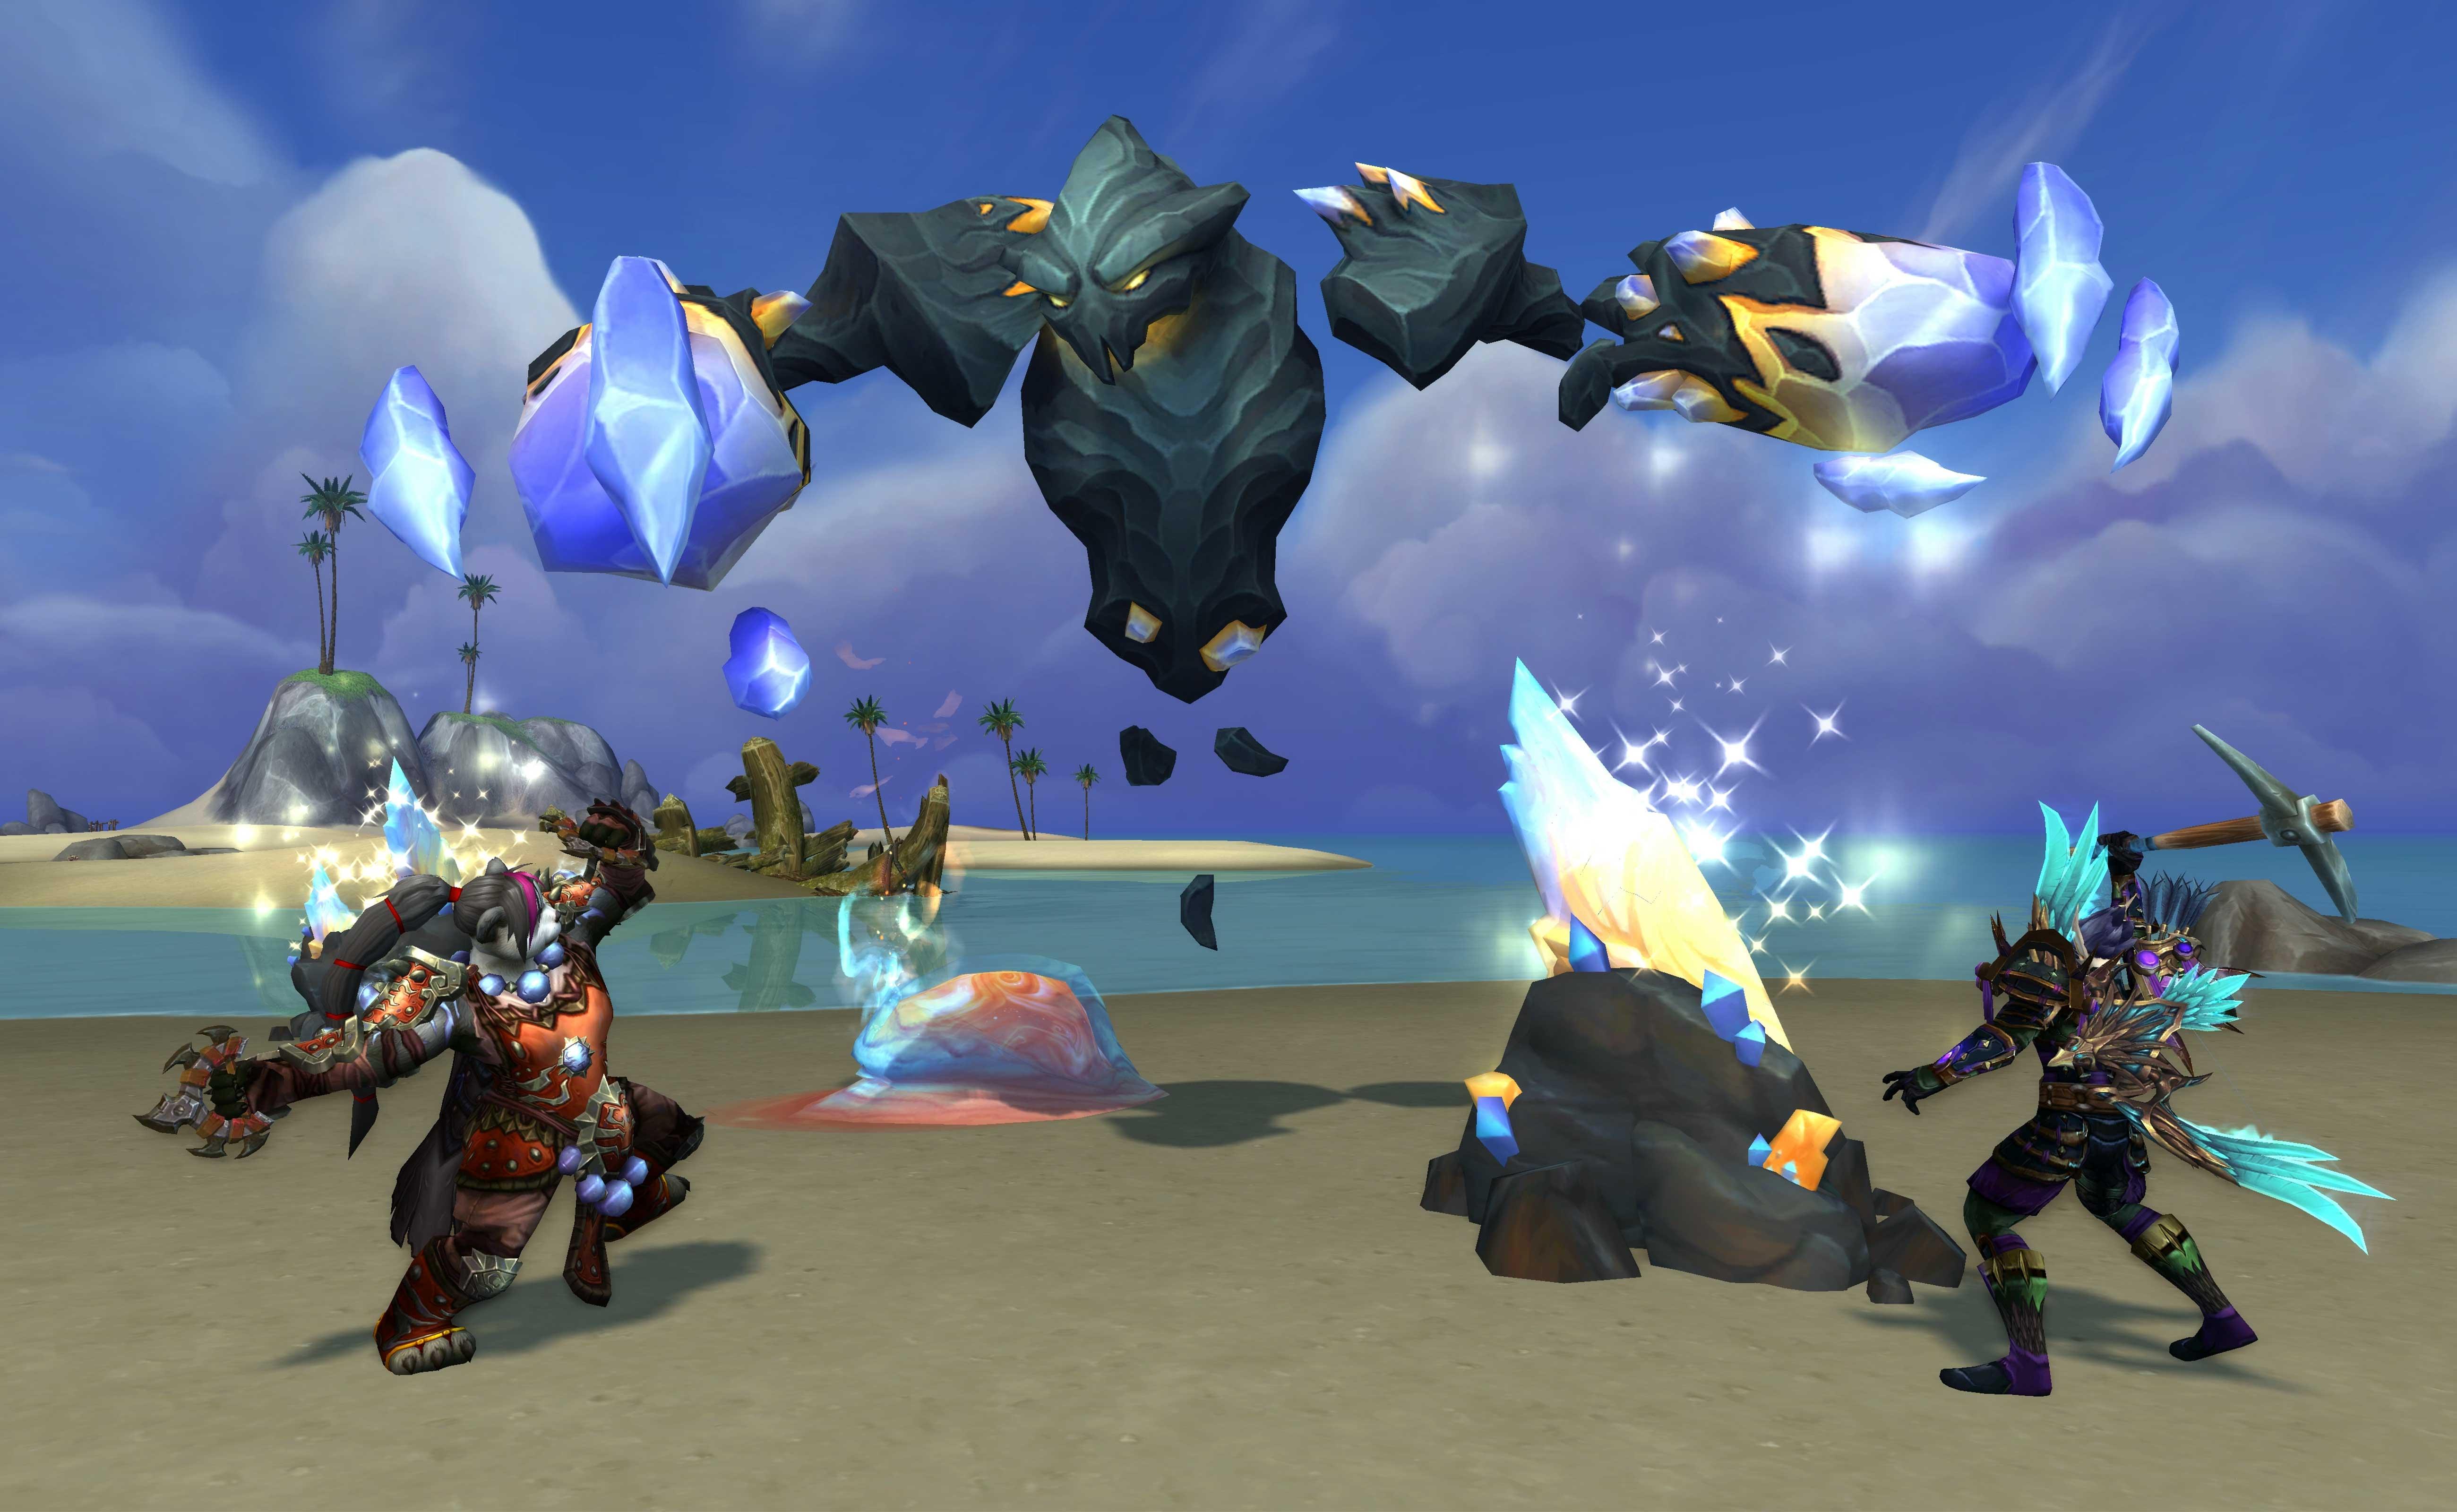 rozgrywka z gry World of Warcraft Battle for Azeroth